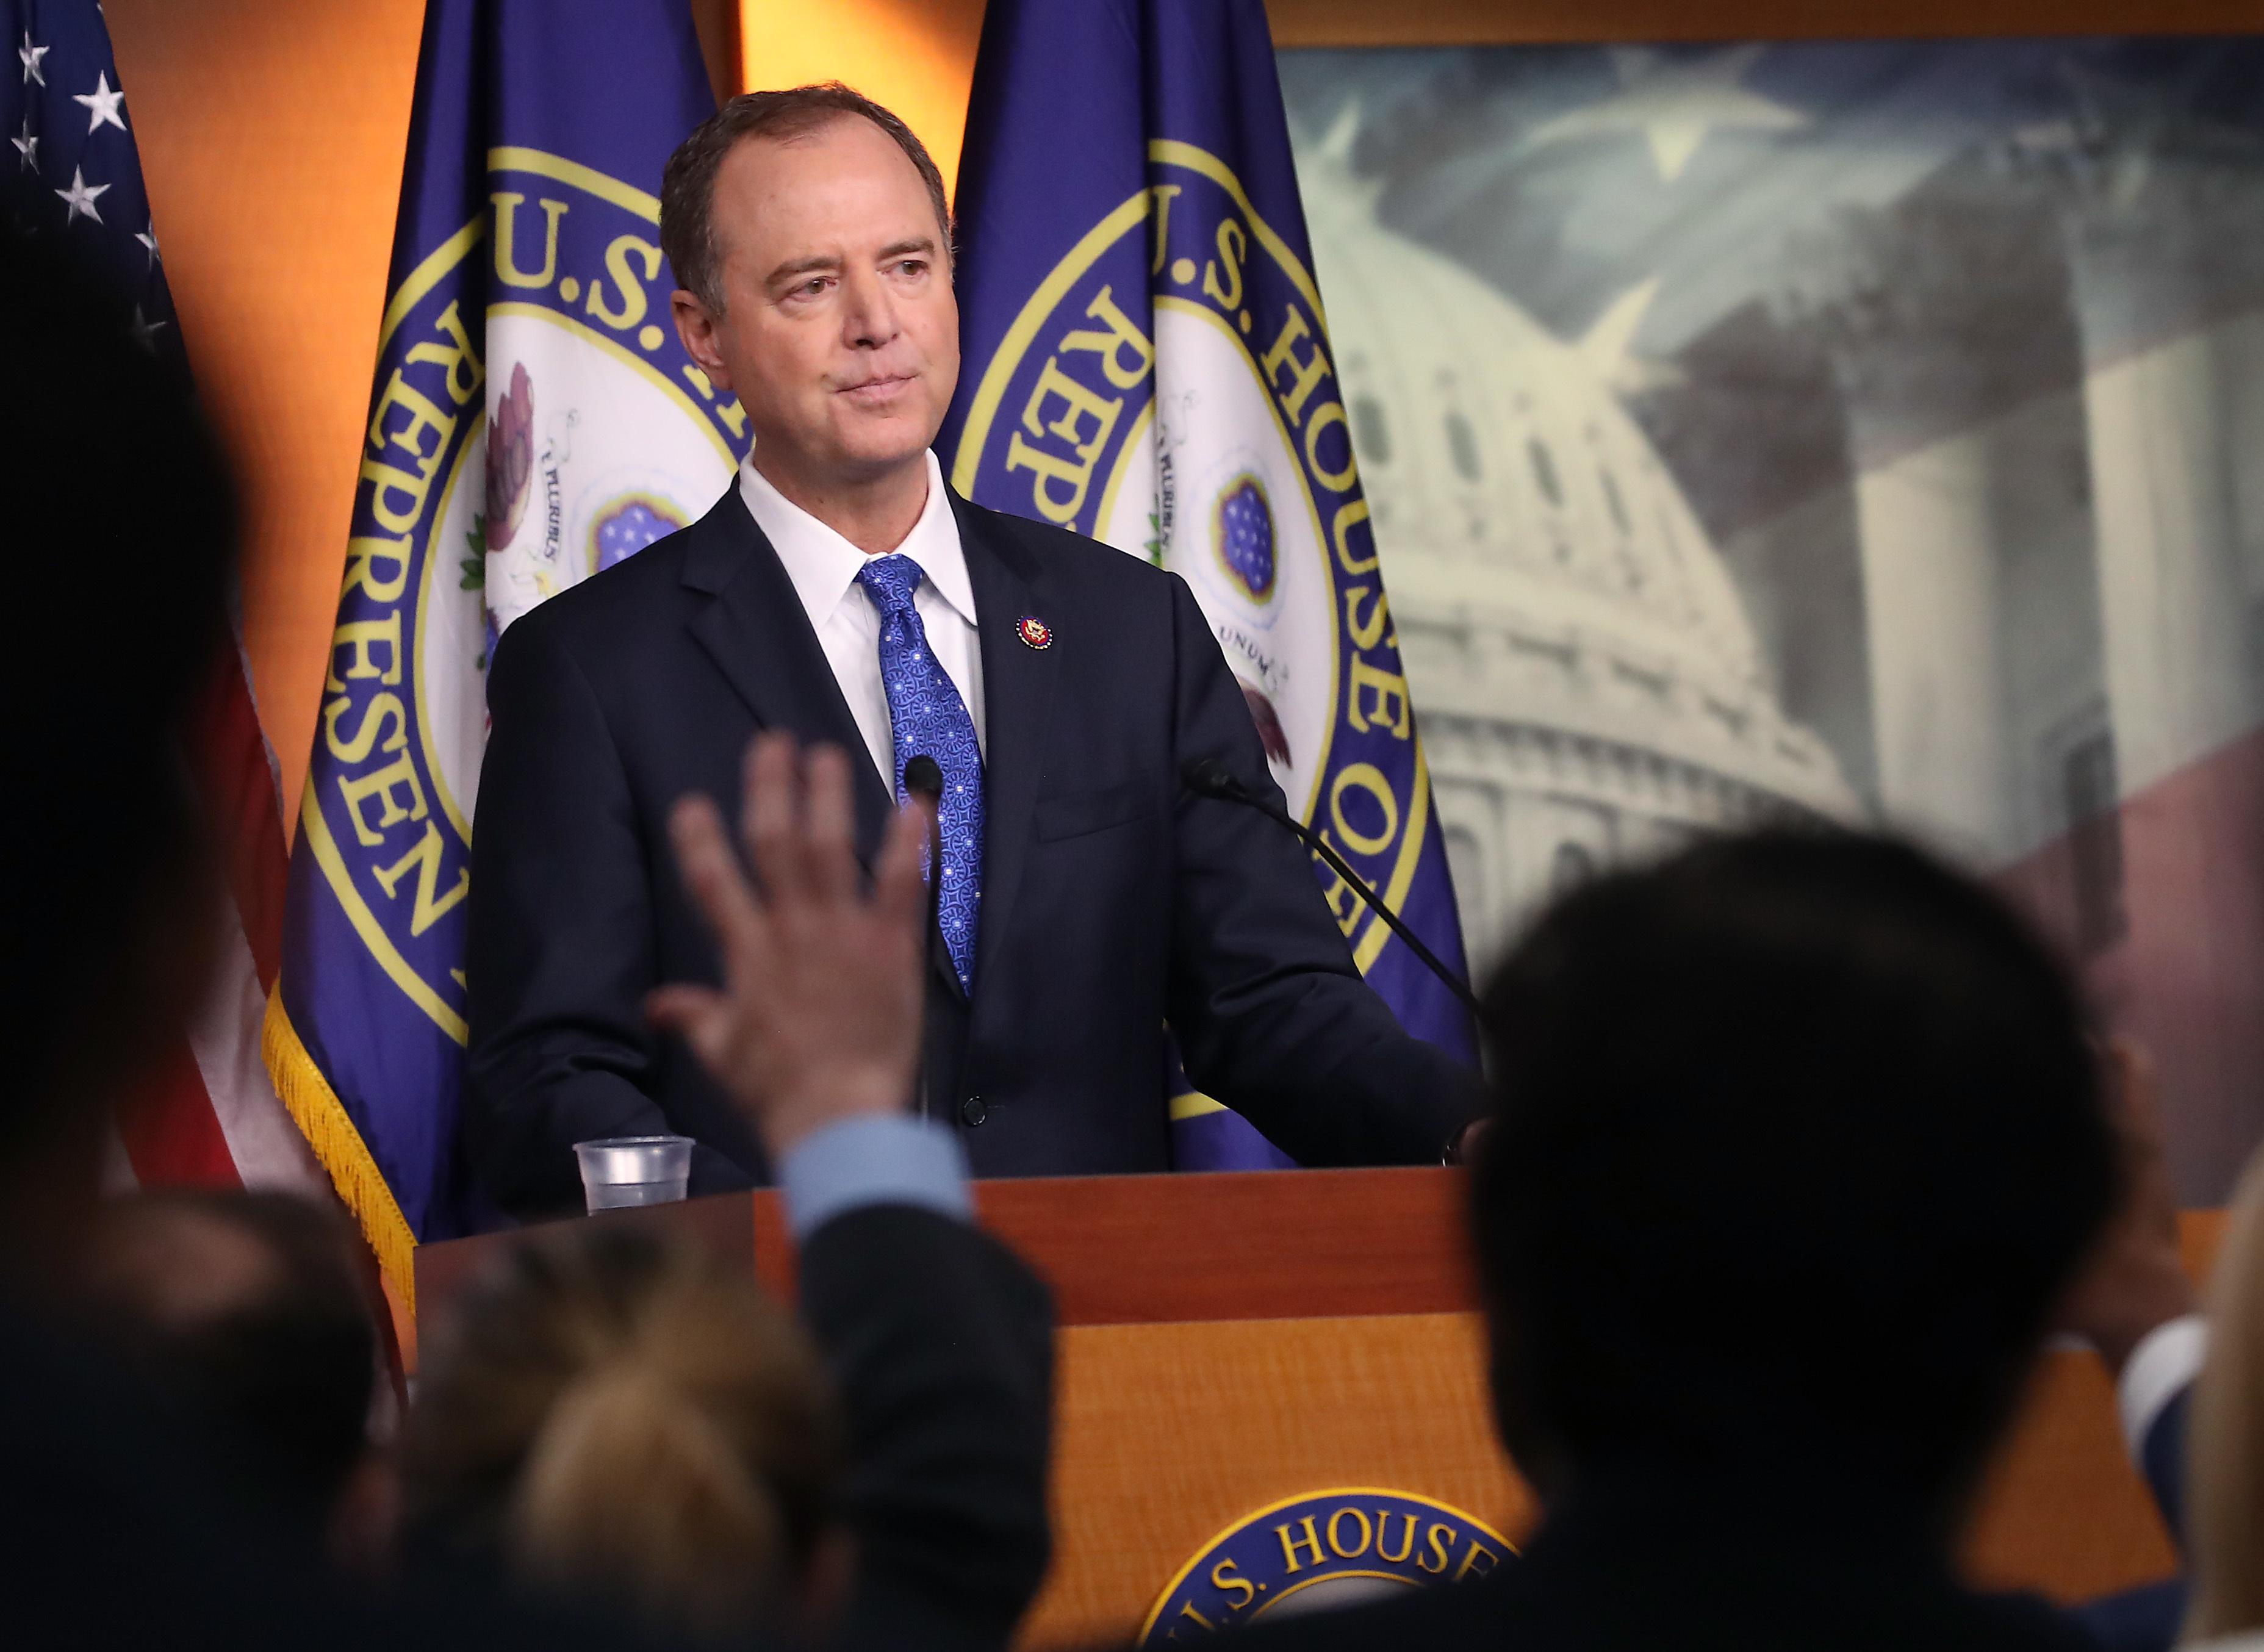 Adam Schiff, The Surprising Face Of The Impeachment Inquiry Into President Trump